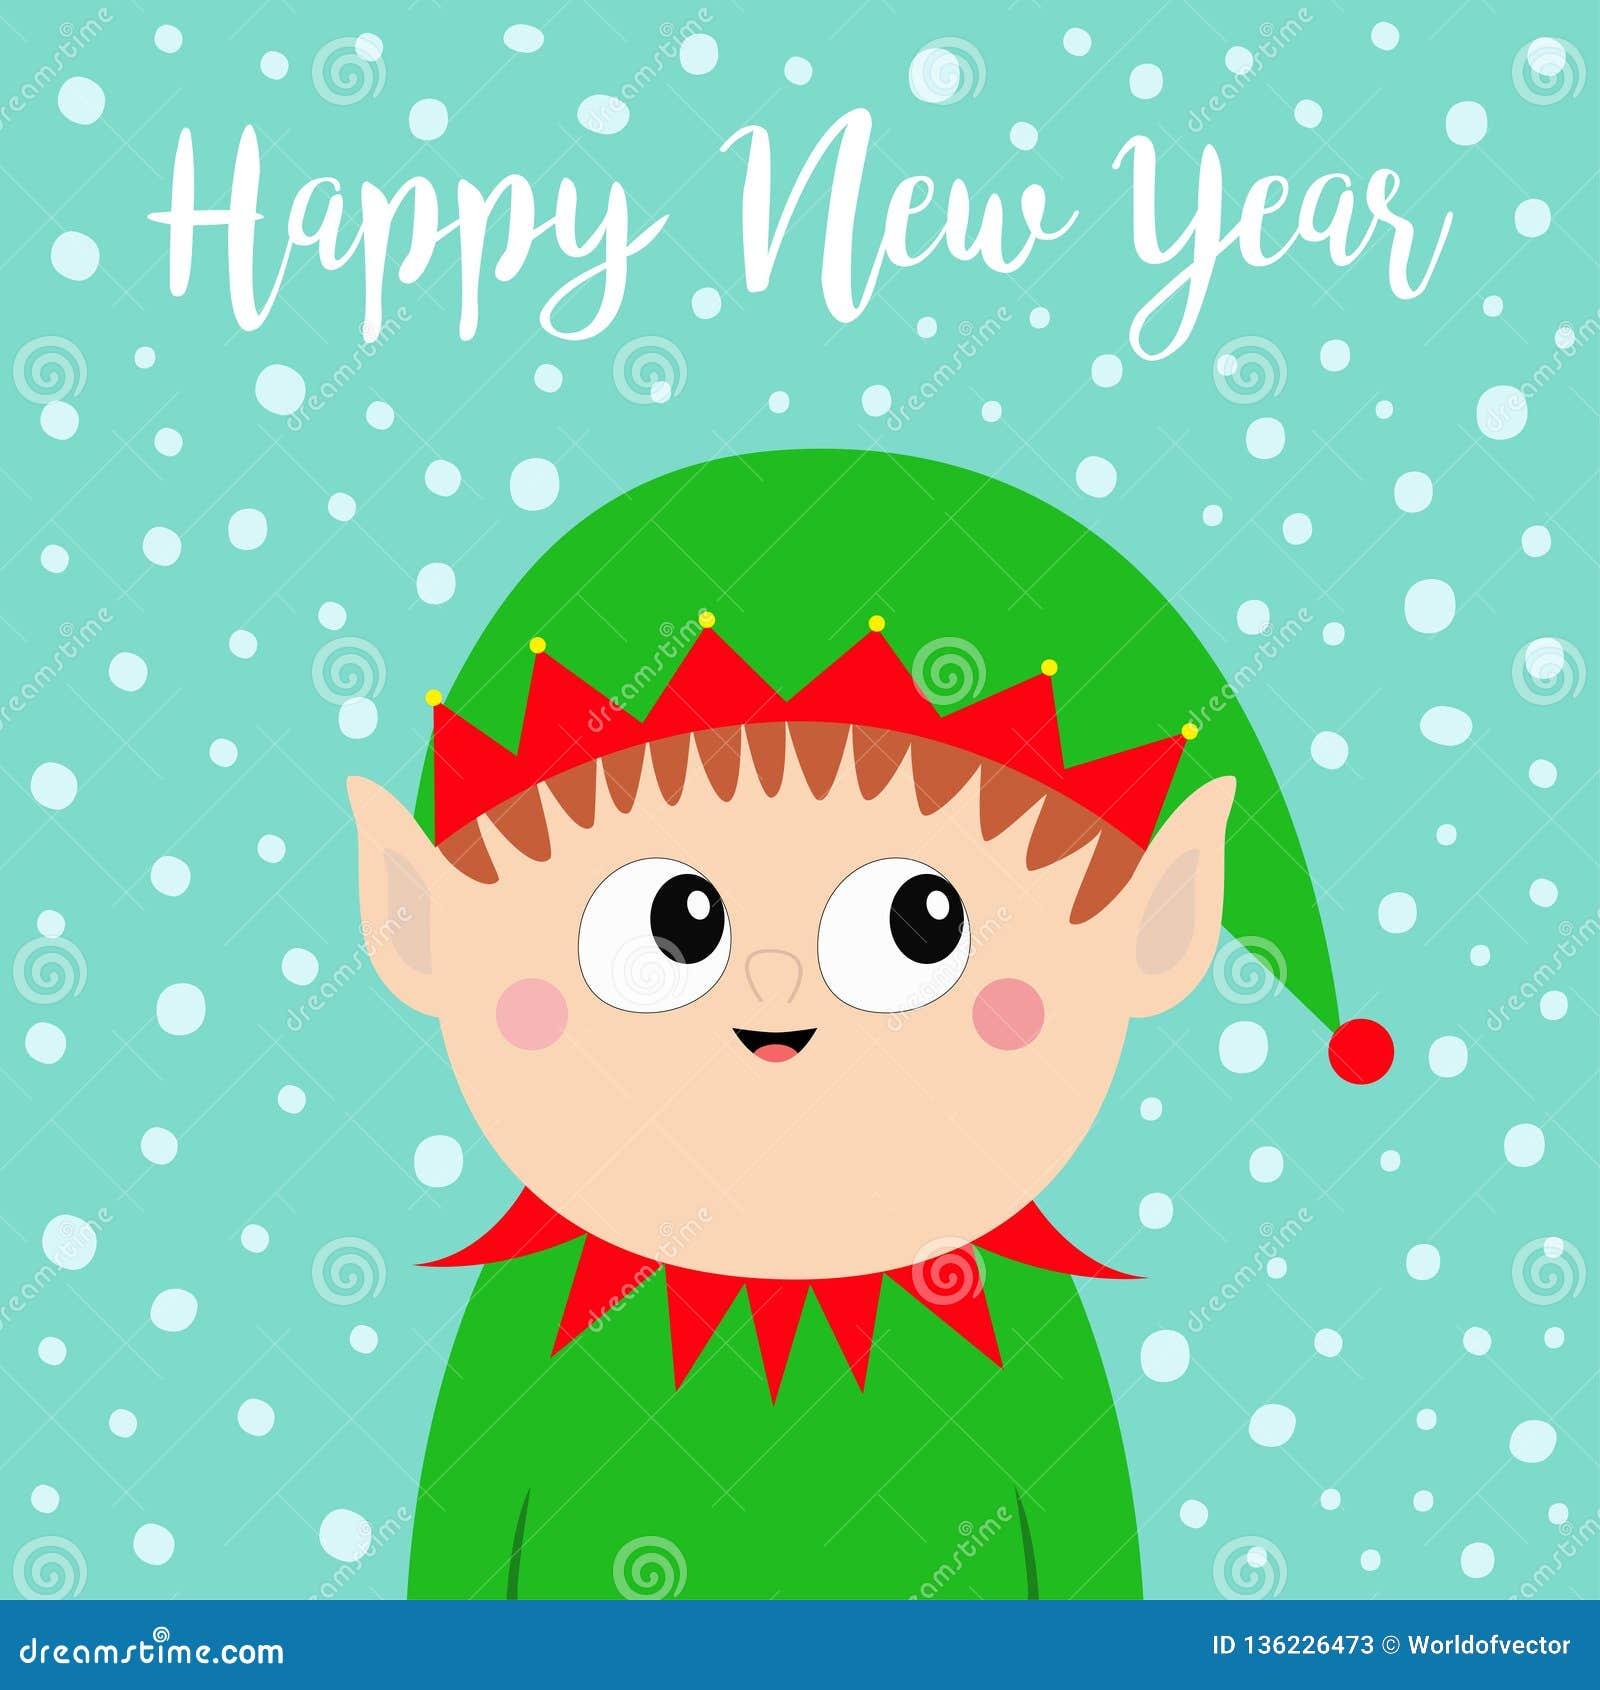 31e0075ff Happy New Year. Santa Claus Elf Head Face Icon. Green Hat. Merry ...